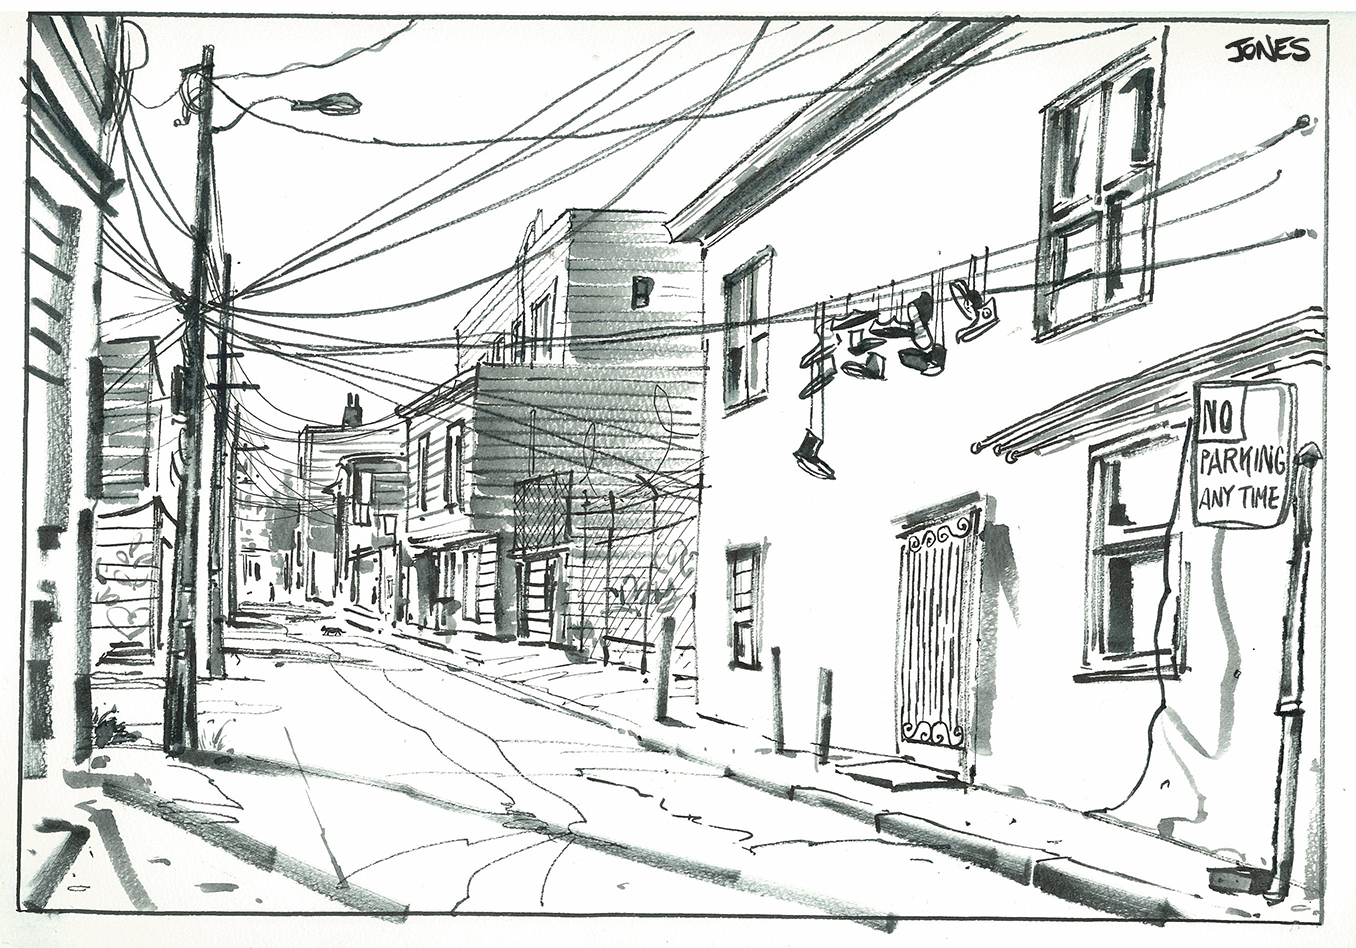 Matt Jones: Winter Sketchcrawl SFO